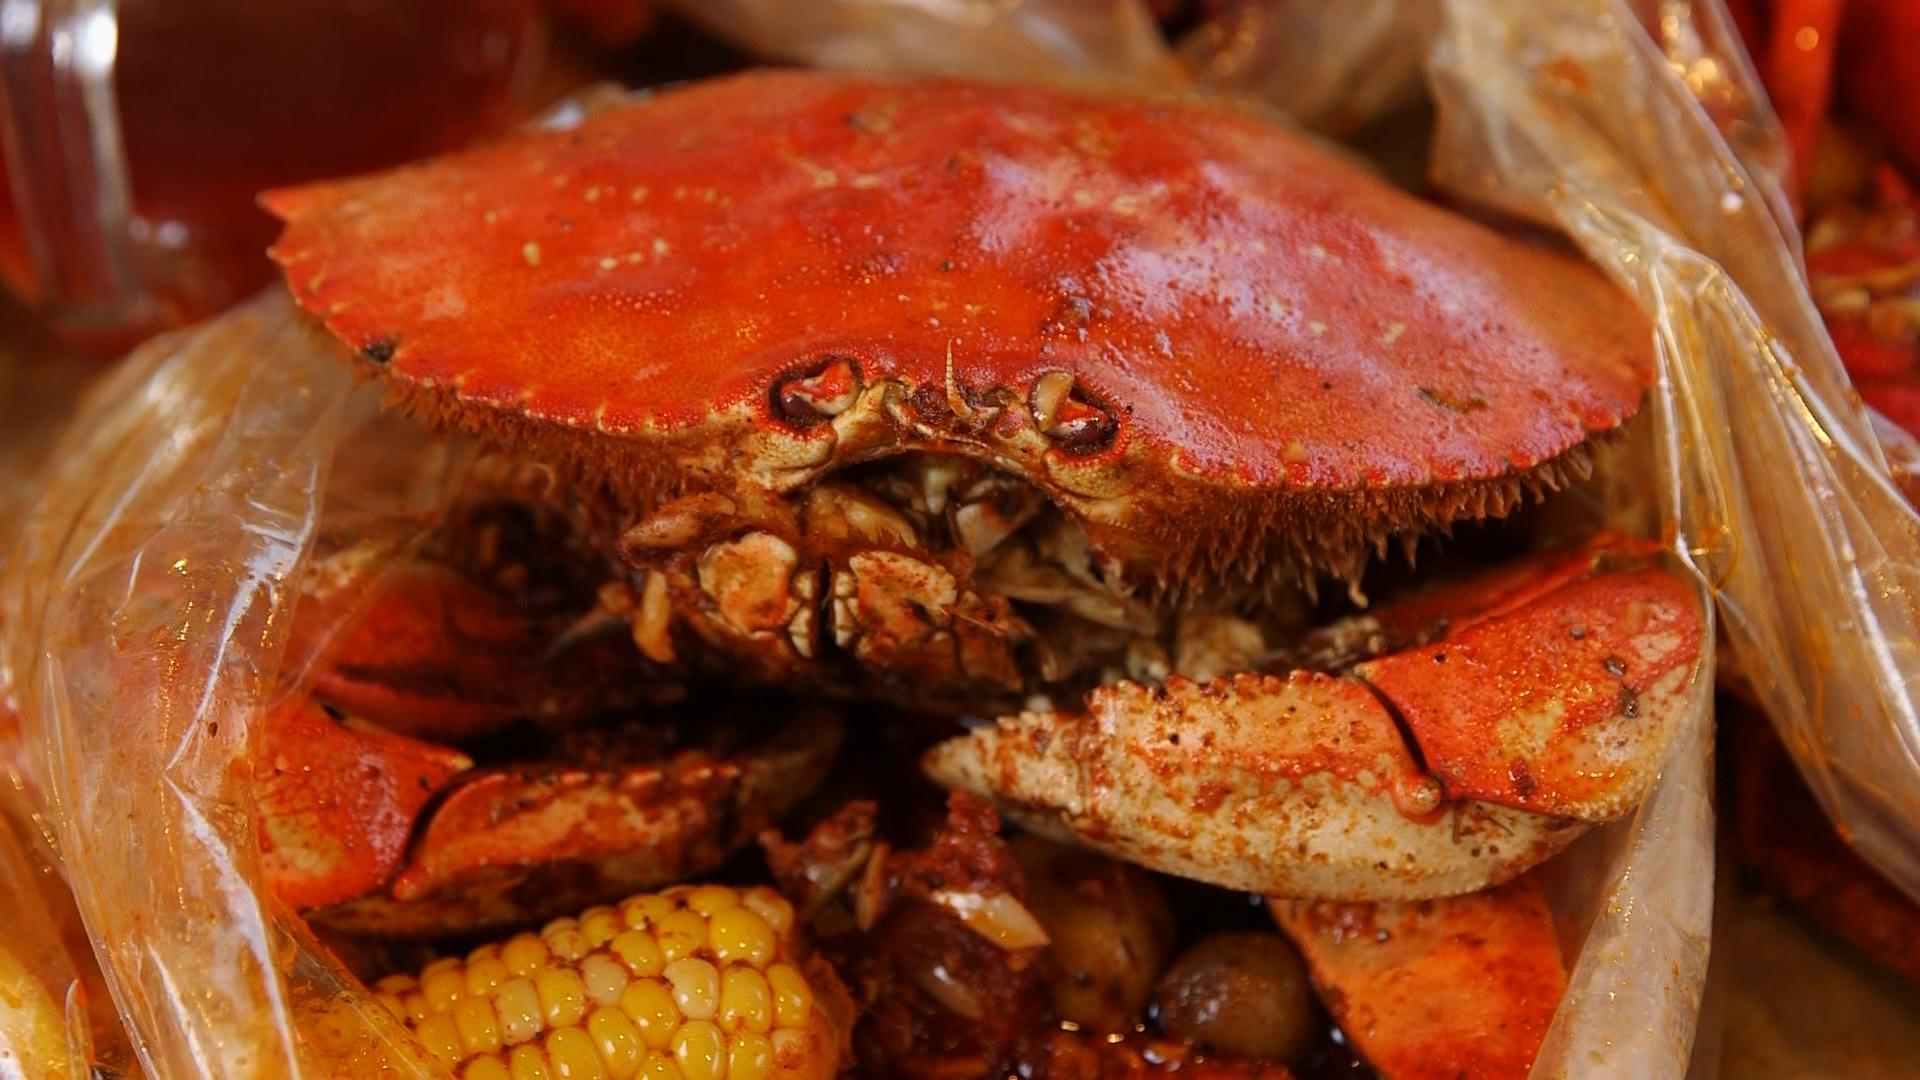 shaking crab dungeoness.jpg